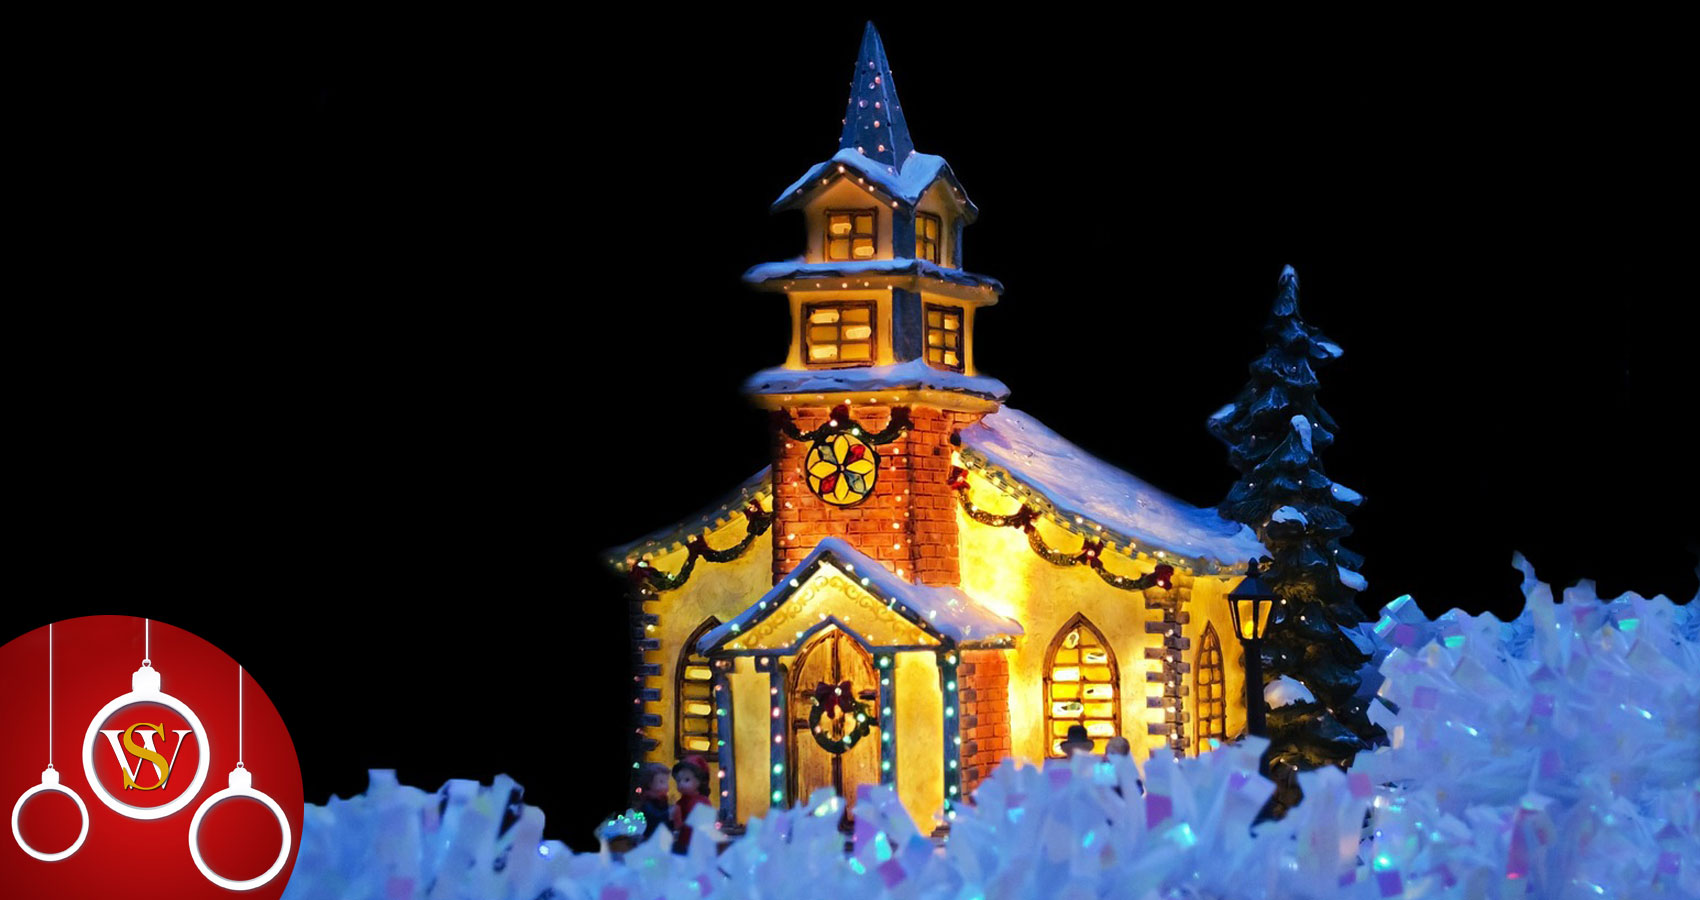 Last Christmas written by Moinak Dutta at Spillwords.com